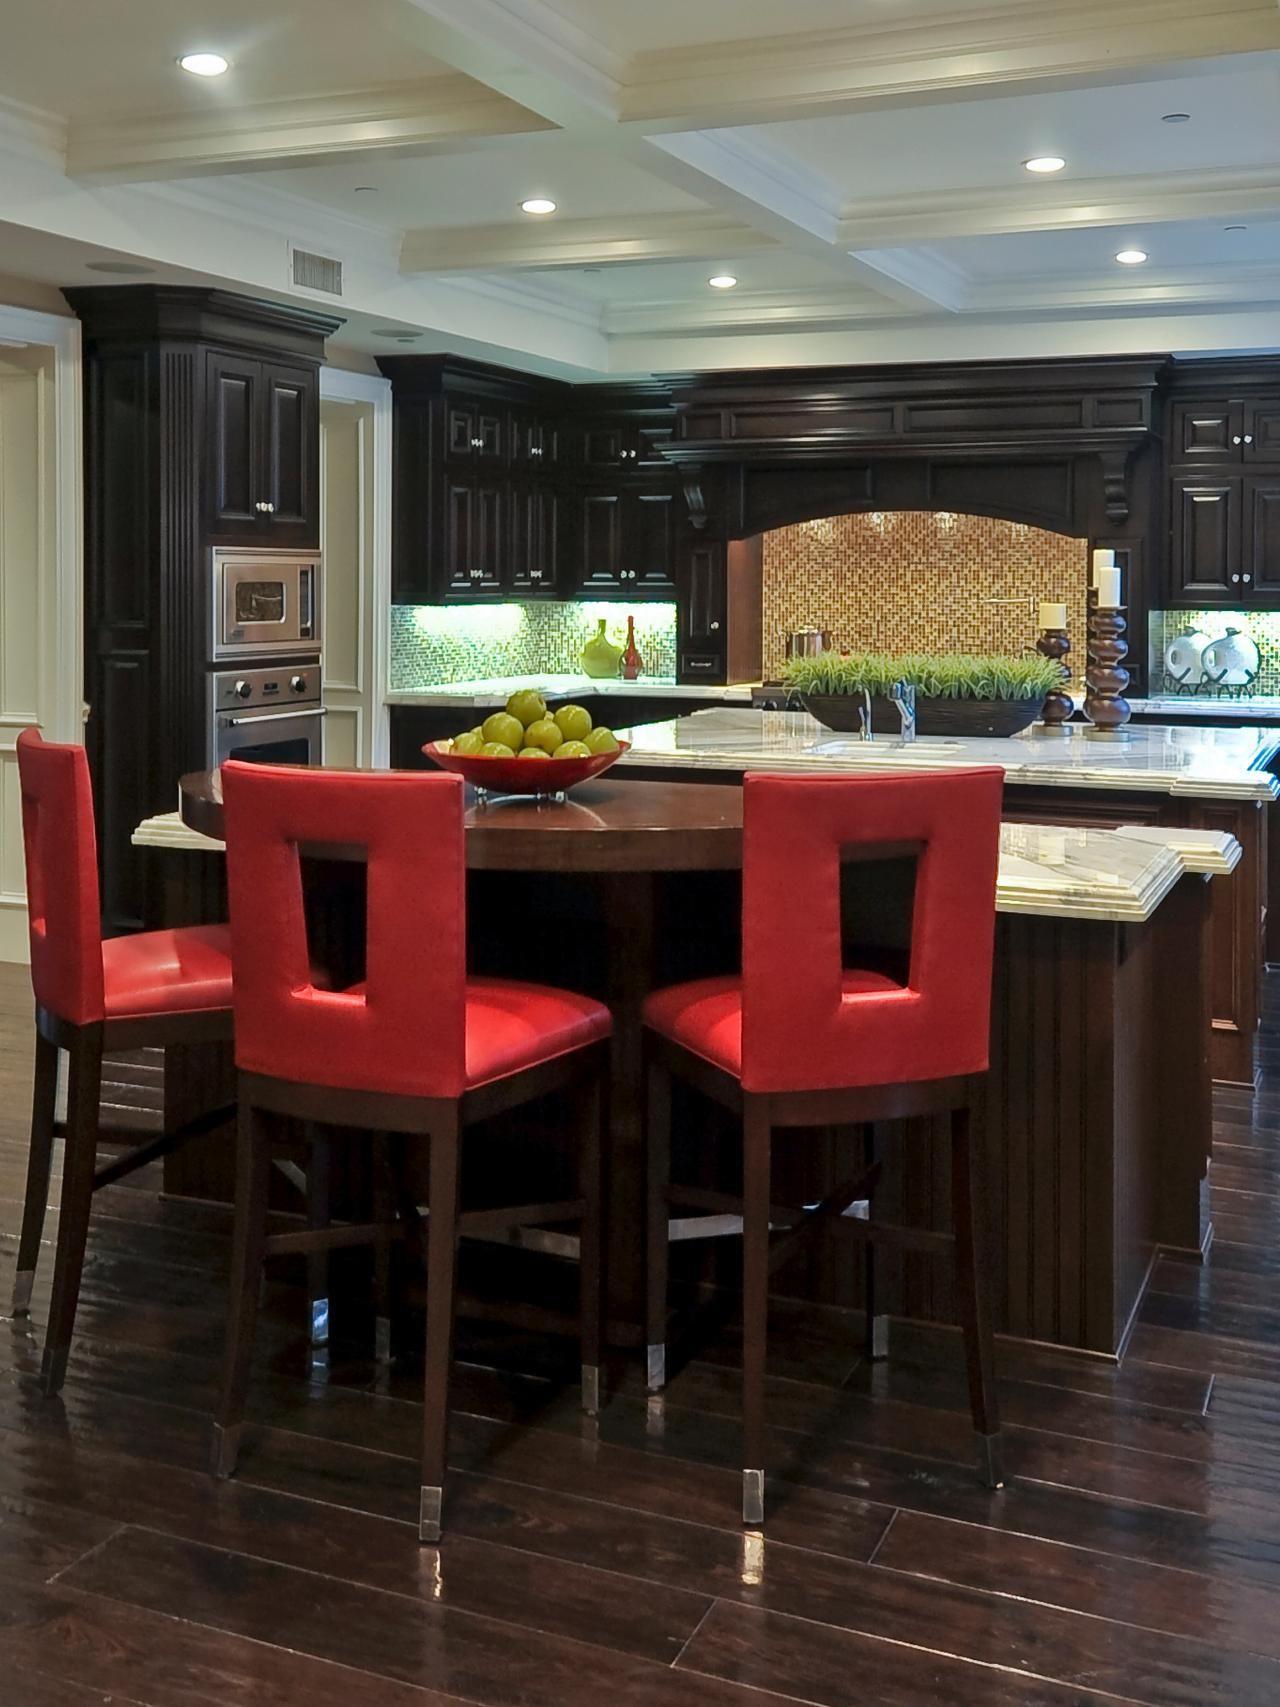 Colorful Kitchens Kitchen Ideas Design   Decoratorist   10750